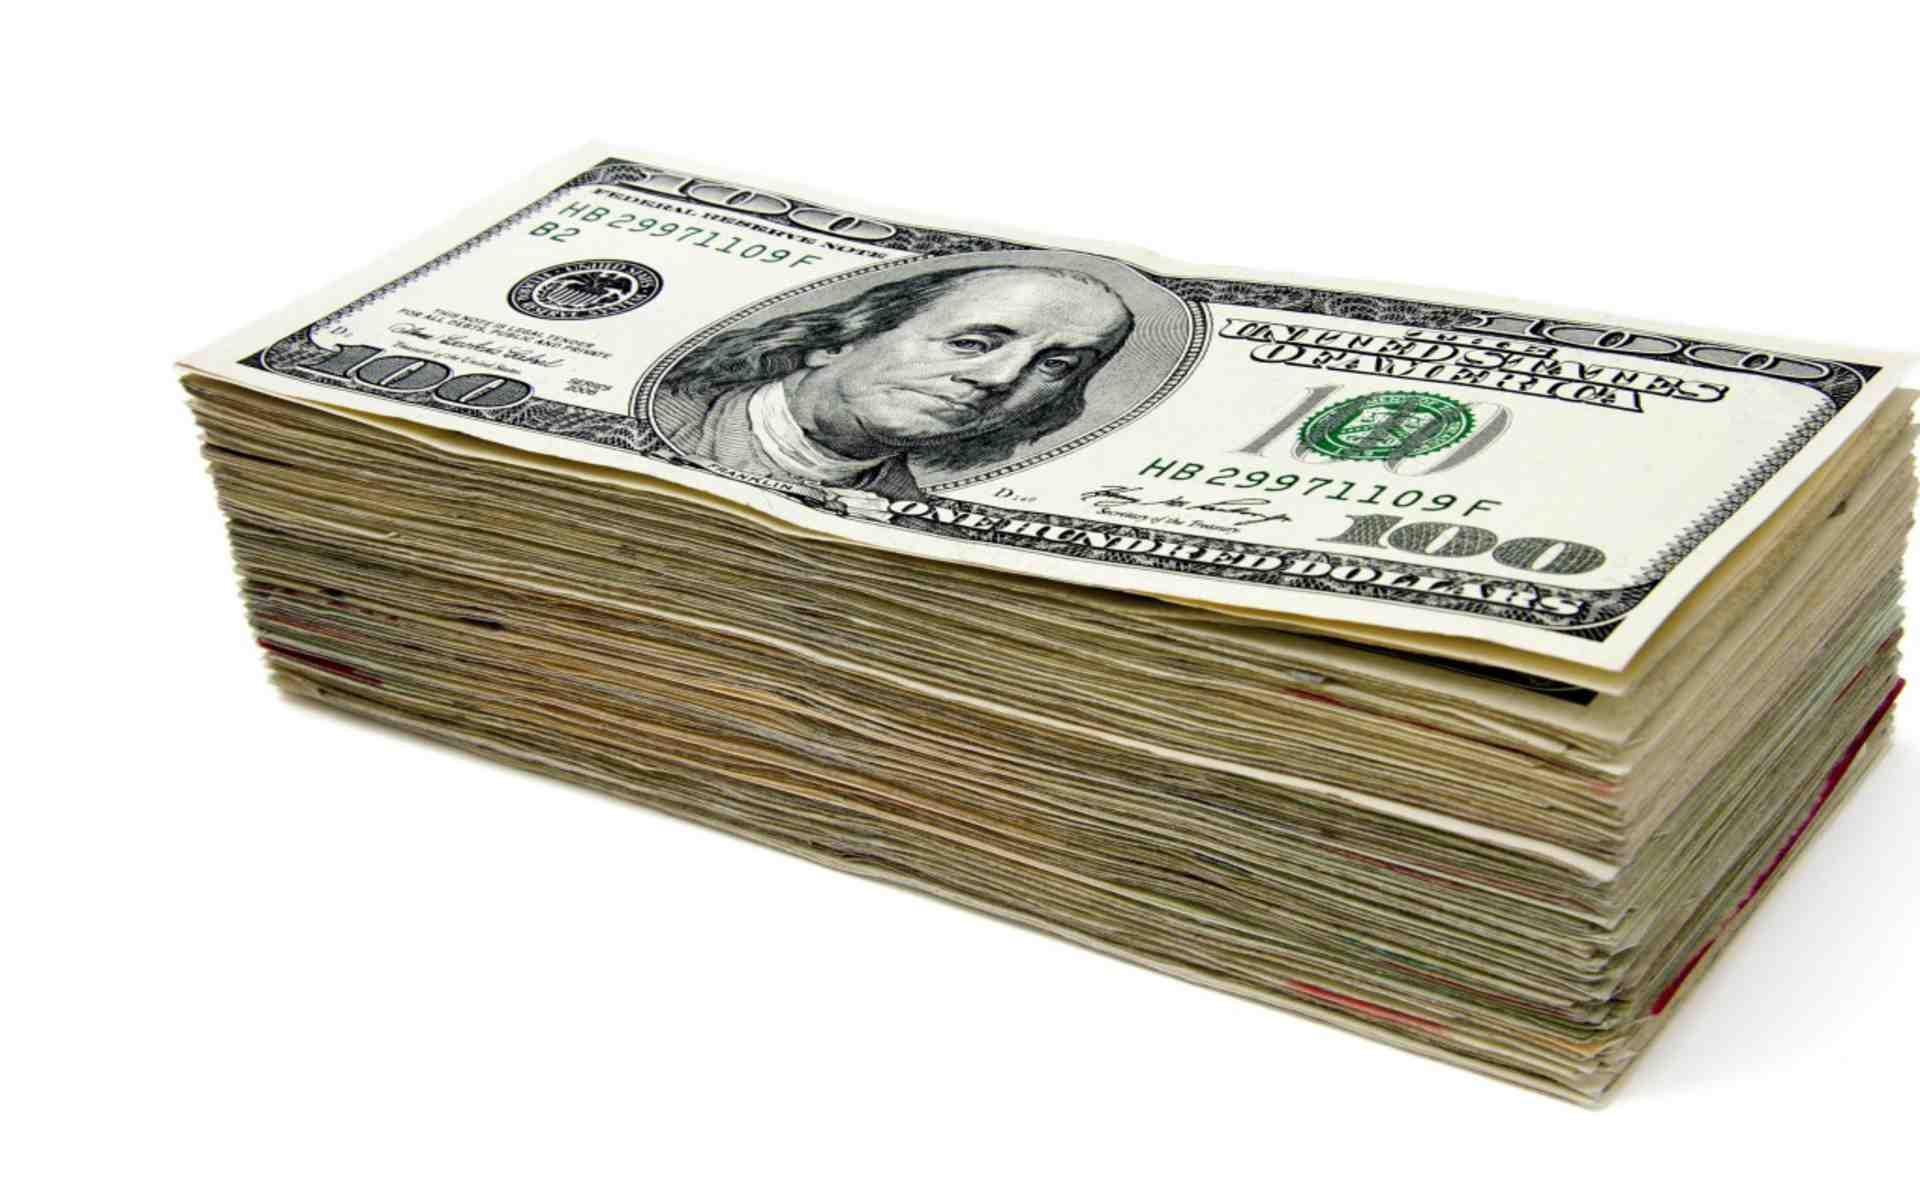 Cash Stacks Wallpaper Money Stacks Wallpaper...